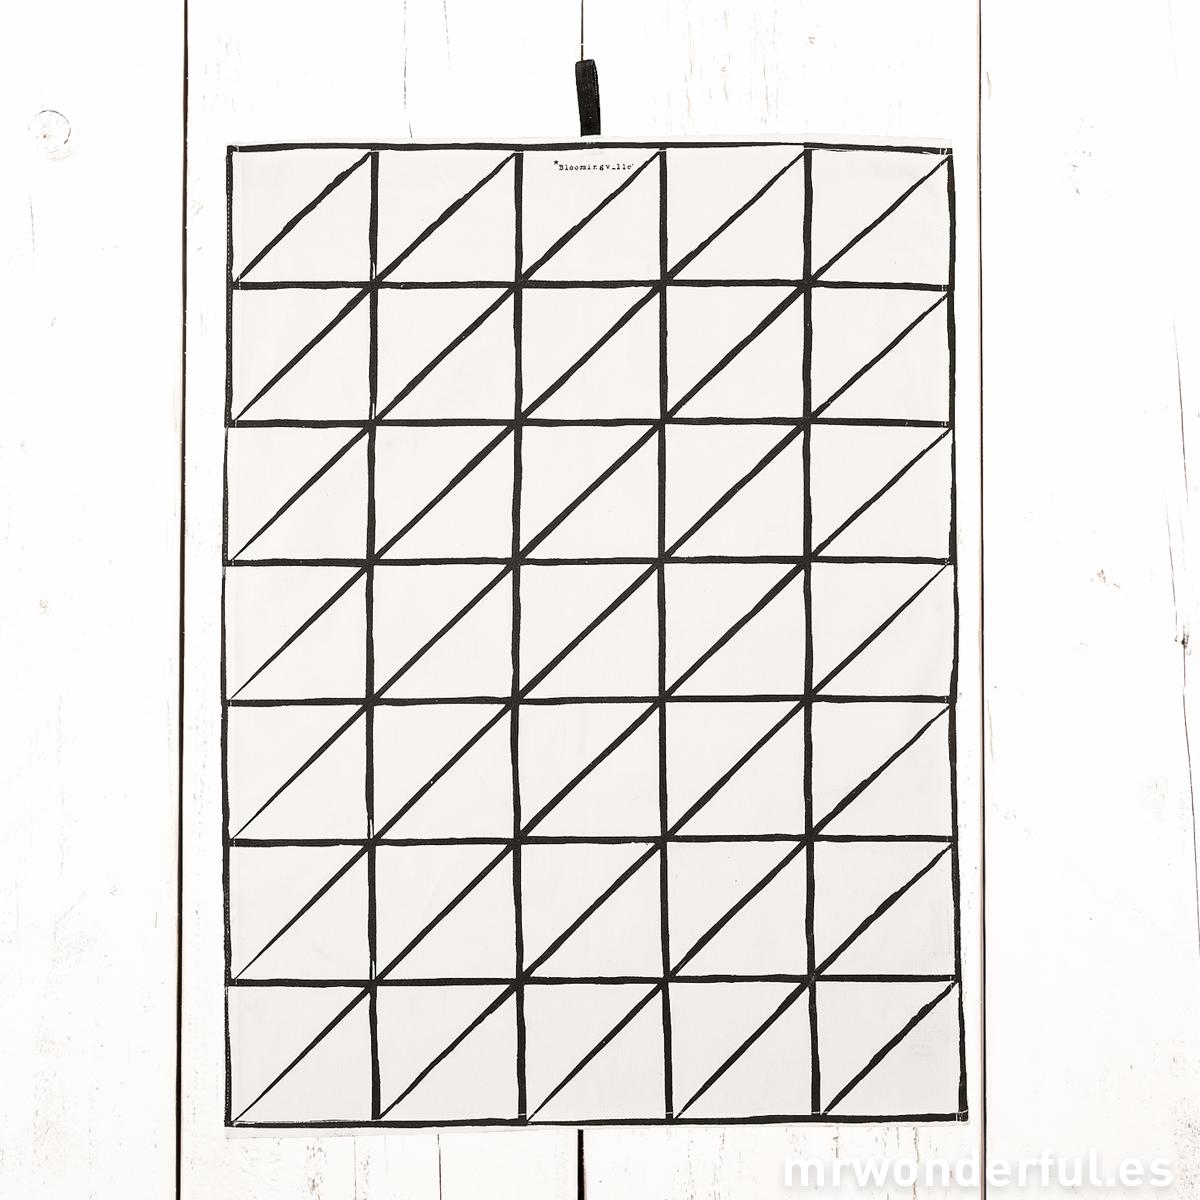 mrwonderful_6200022_1_trapo-cocina-estampado-geometrico-grande-1